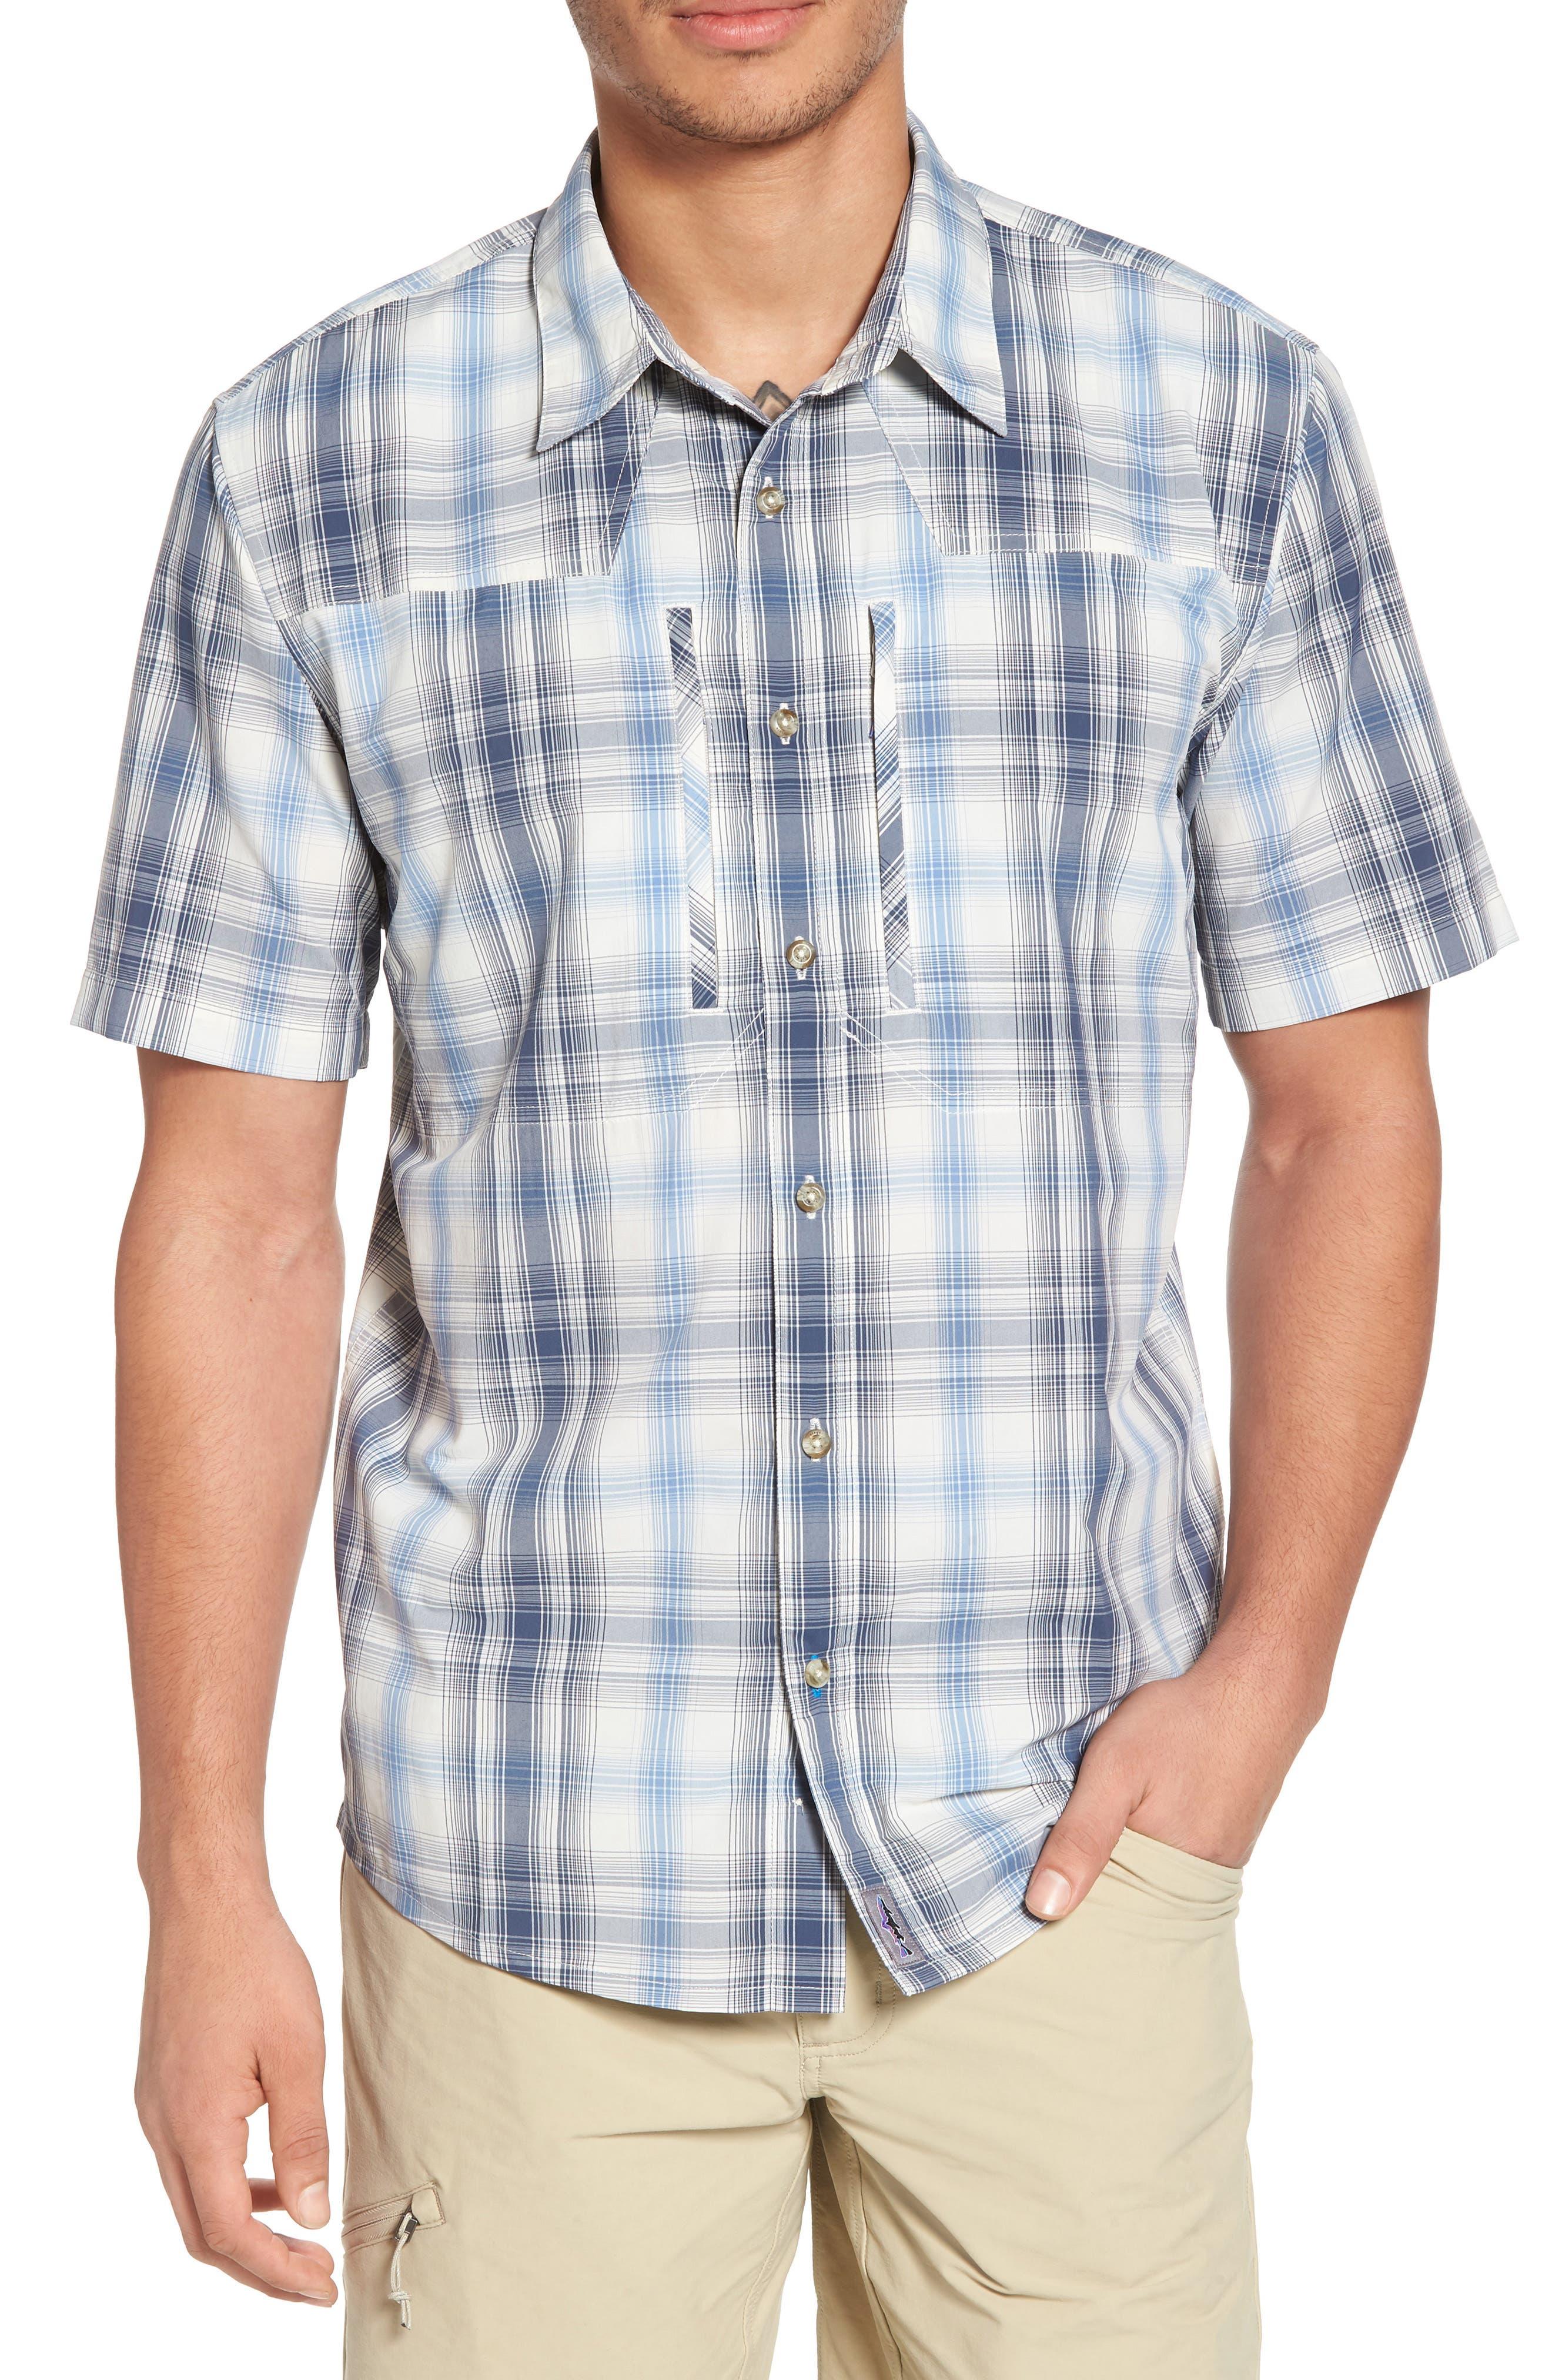 M's Sun Plaid Stretch Hybrid Shirt,                             Main thumbnail 1, color,                             KING SWING RADAR BLUE